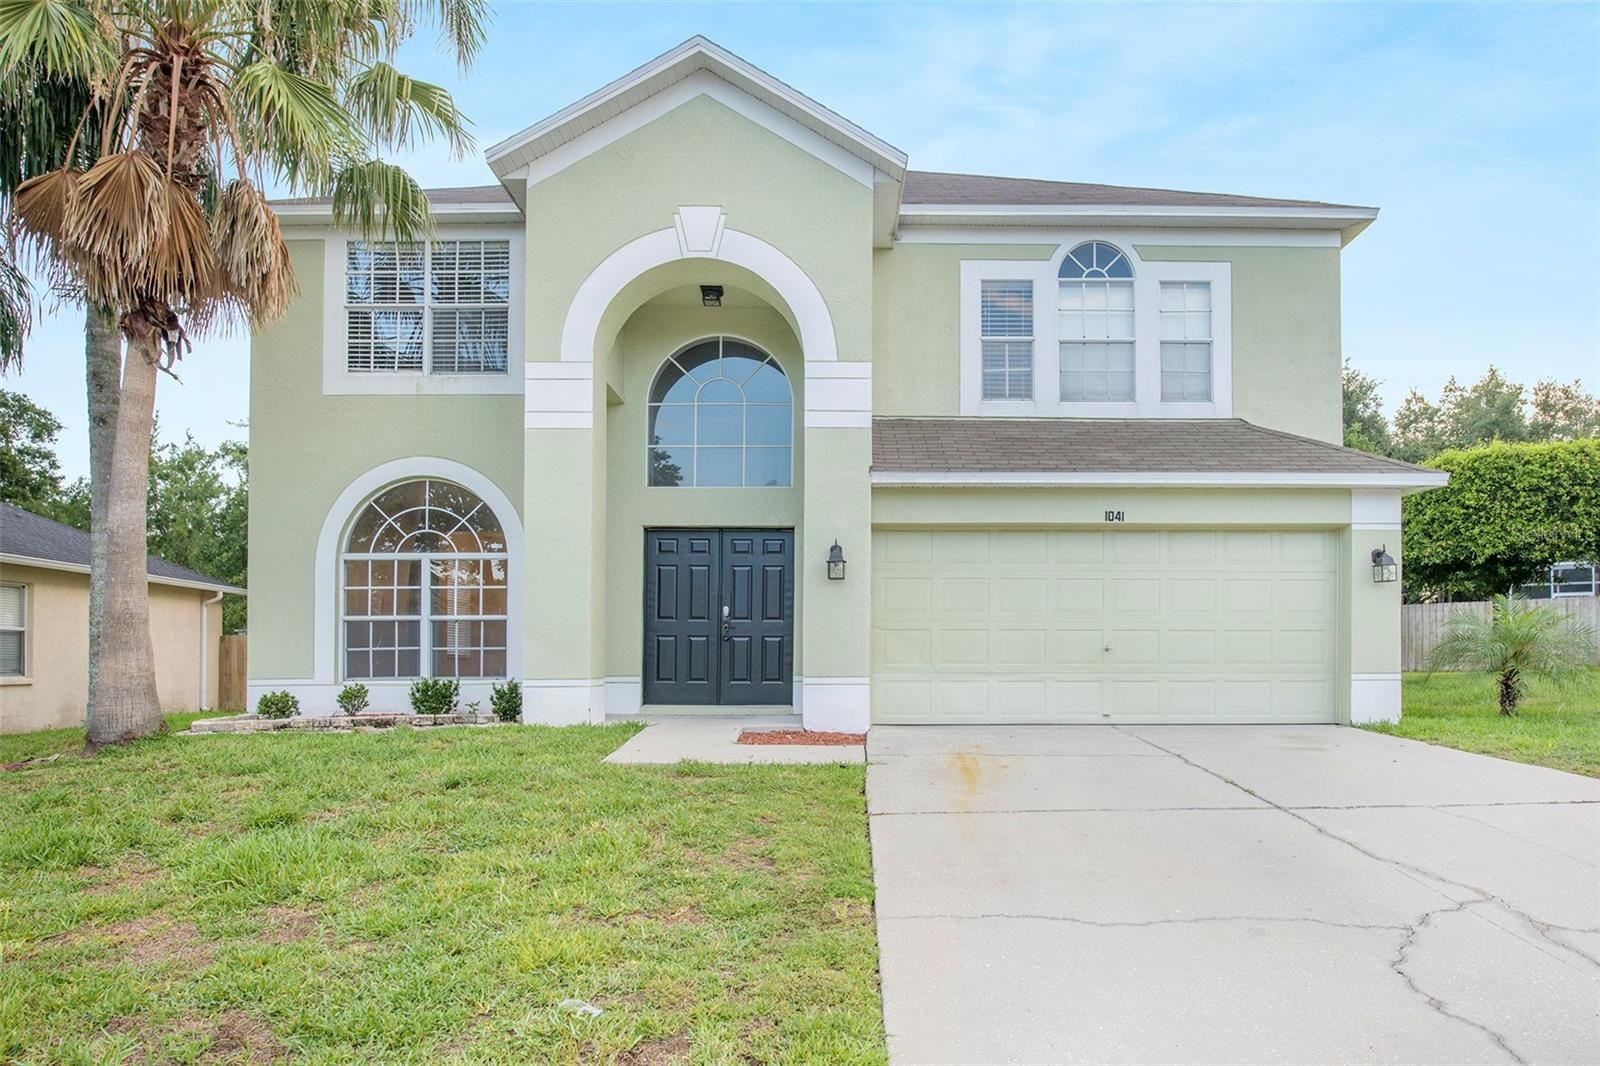 1041 GRAND CANYON DRIVE, Valrico, FL 33594 - MLS#: O5951364